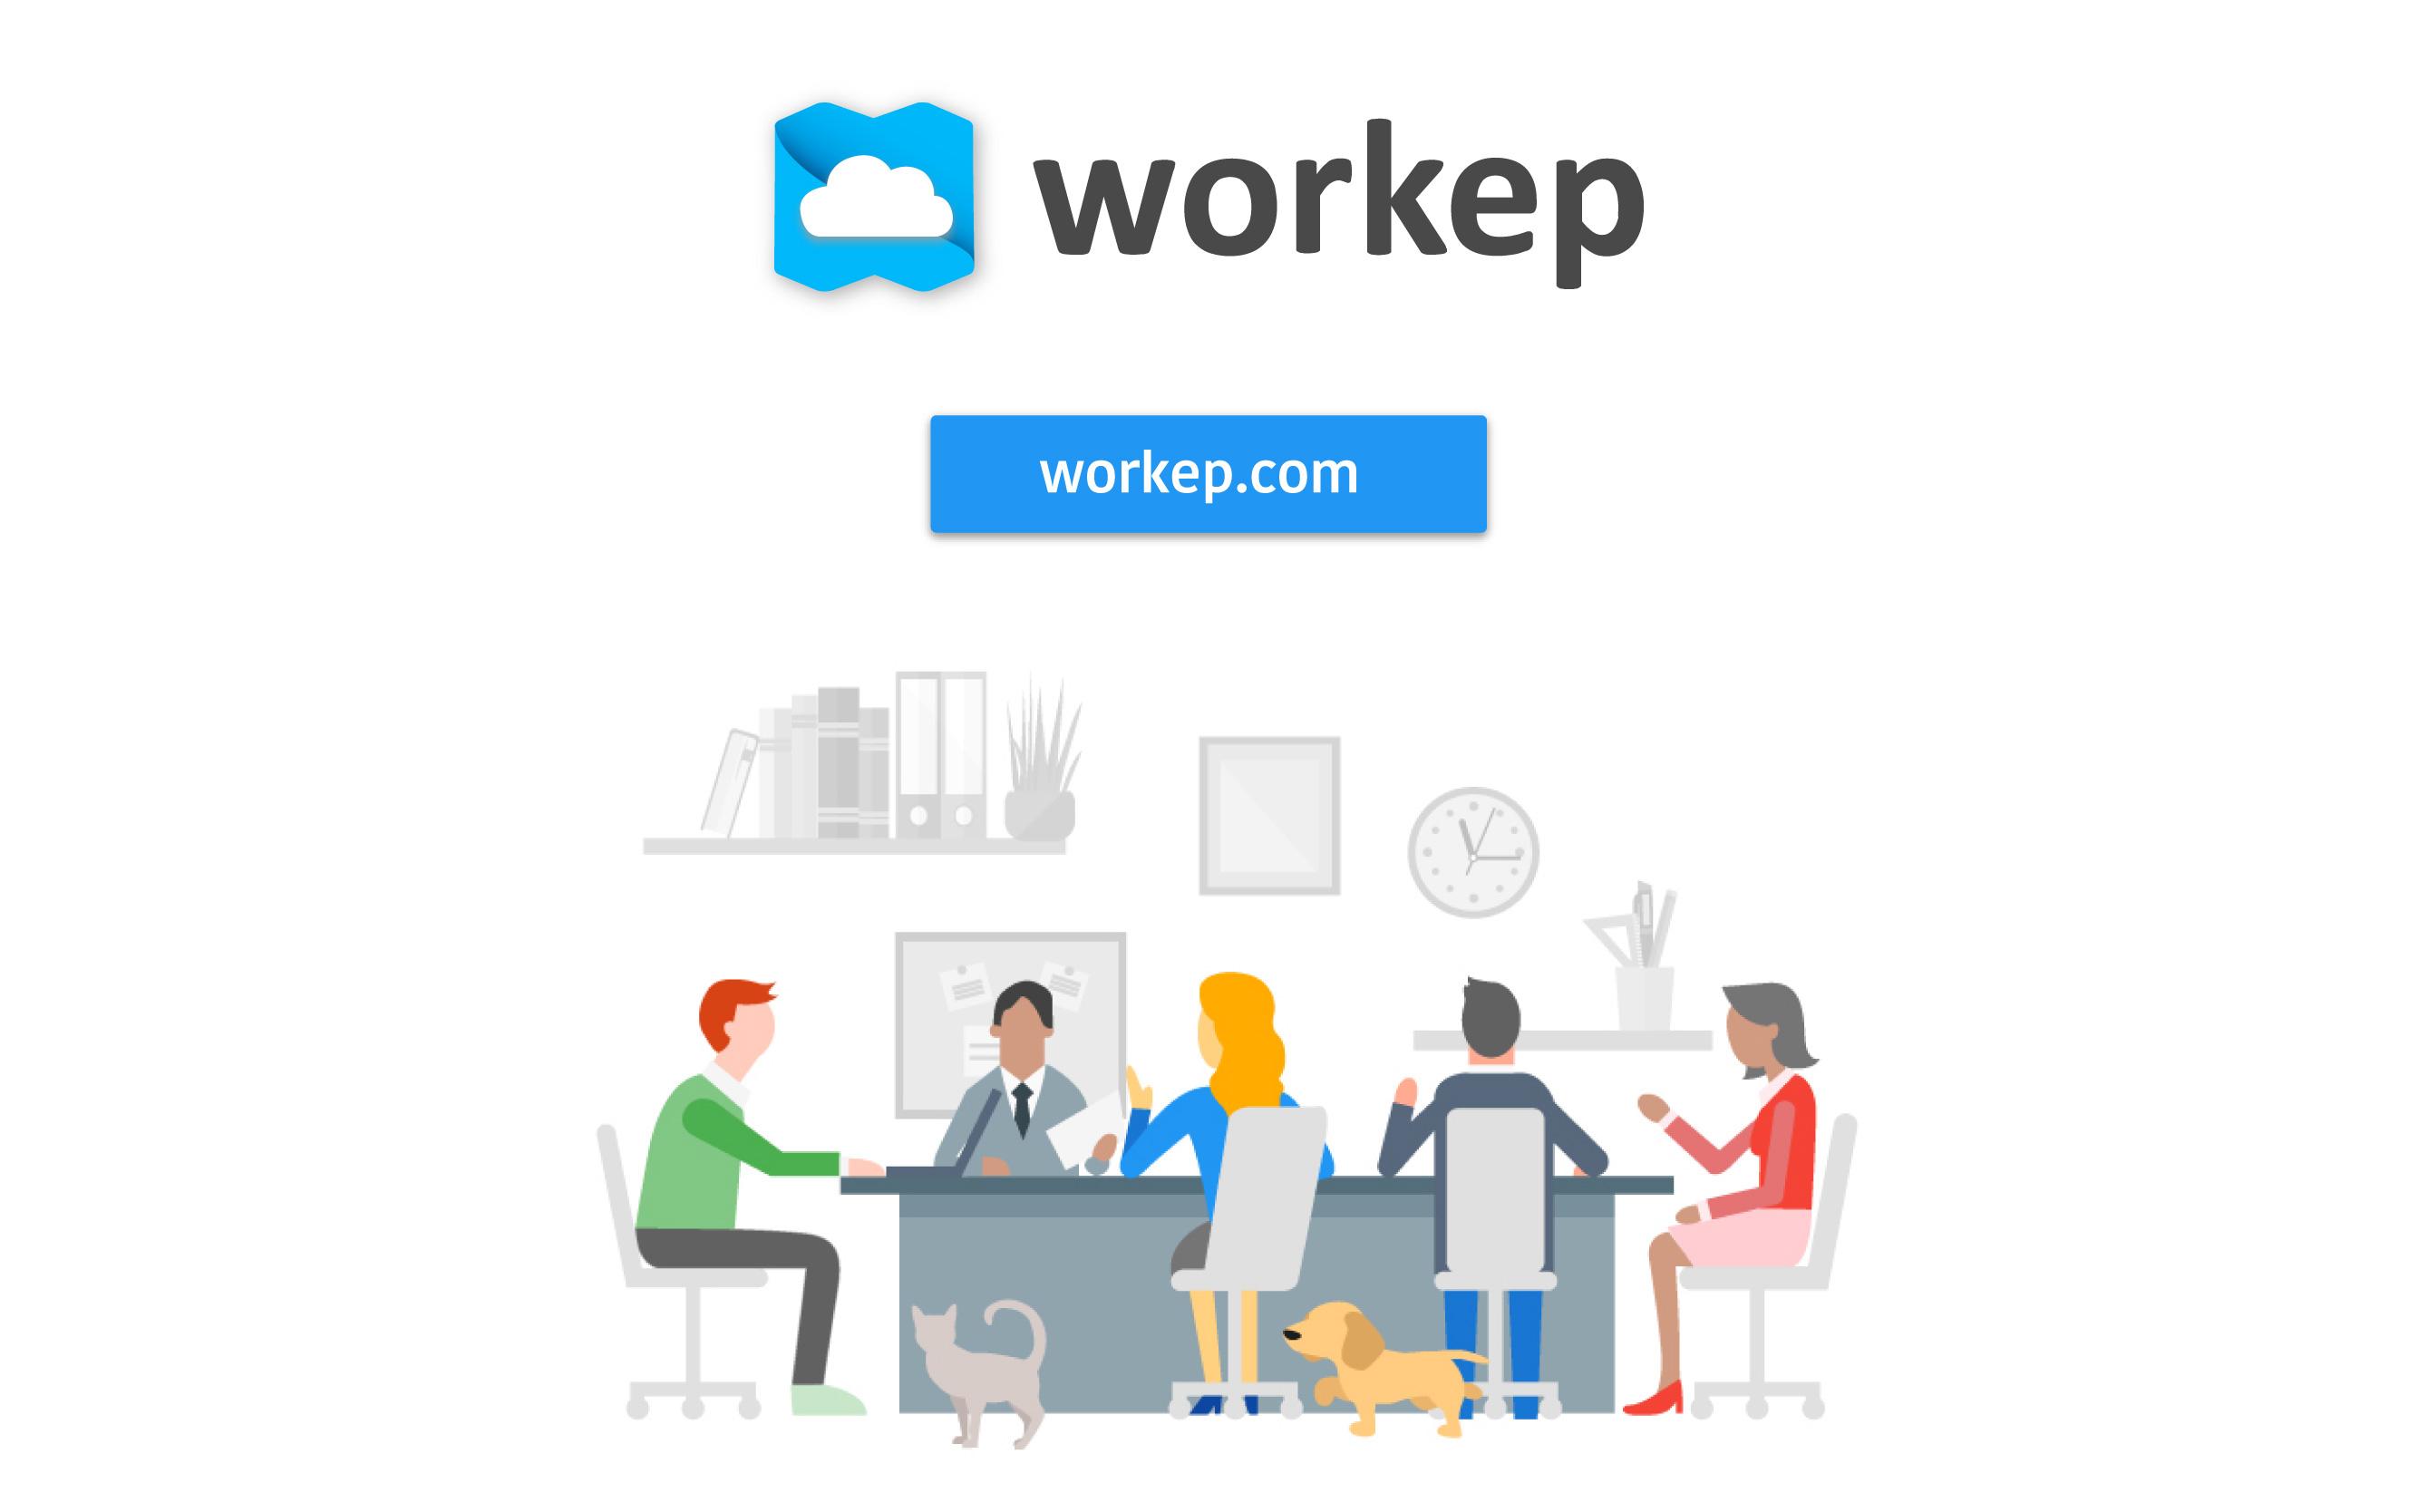 workep